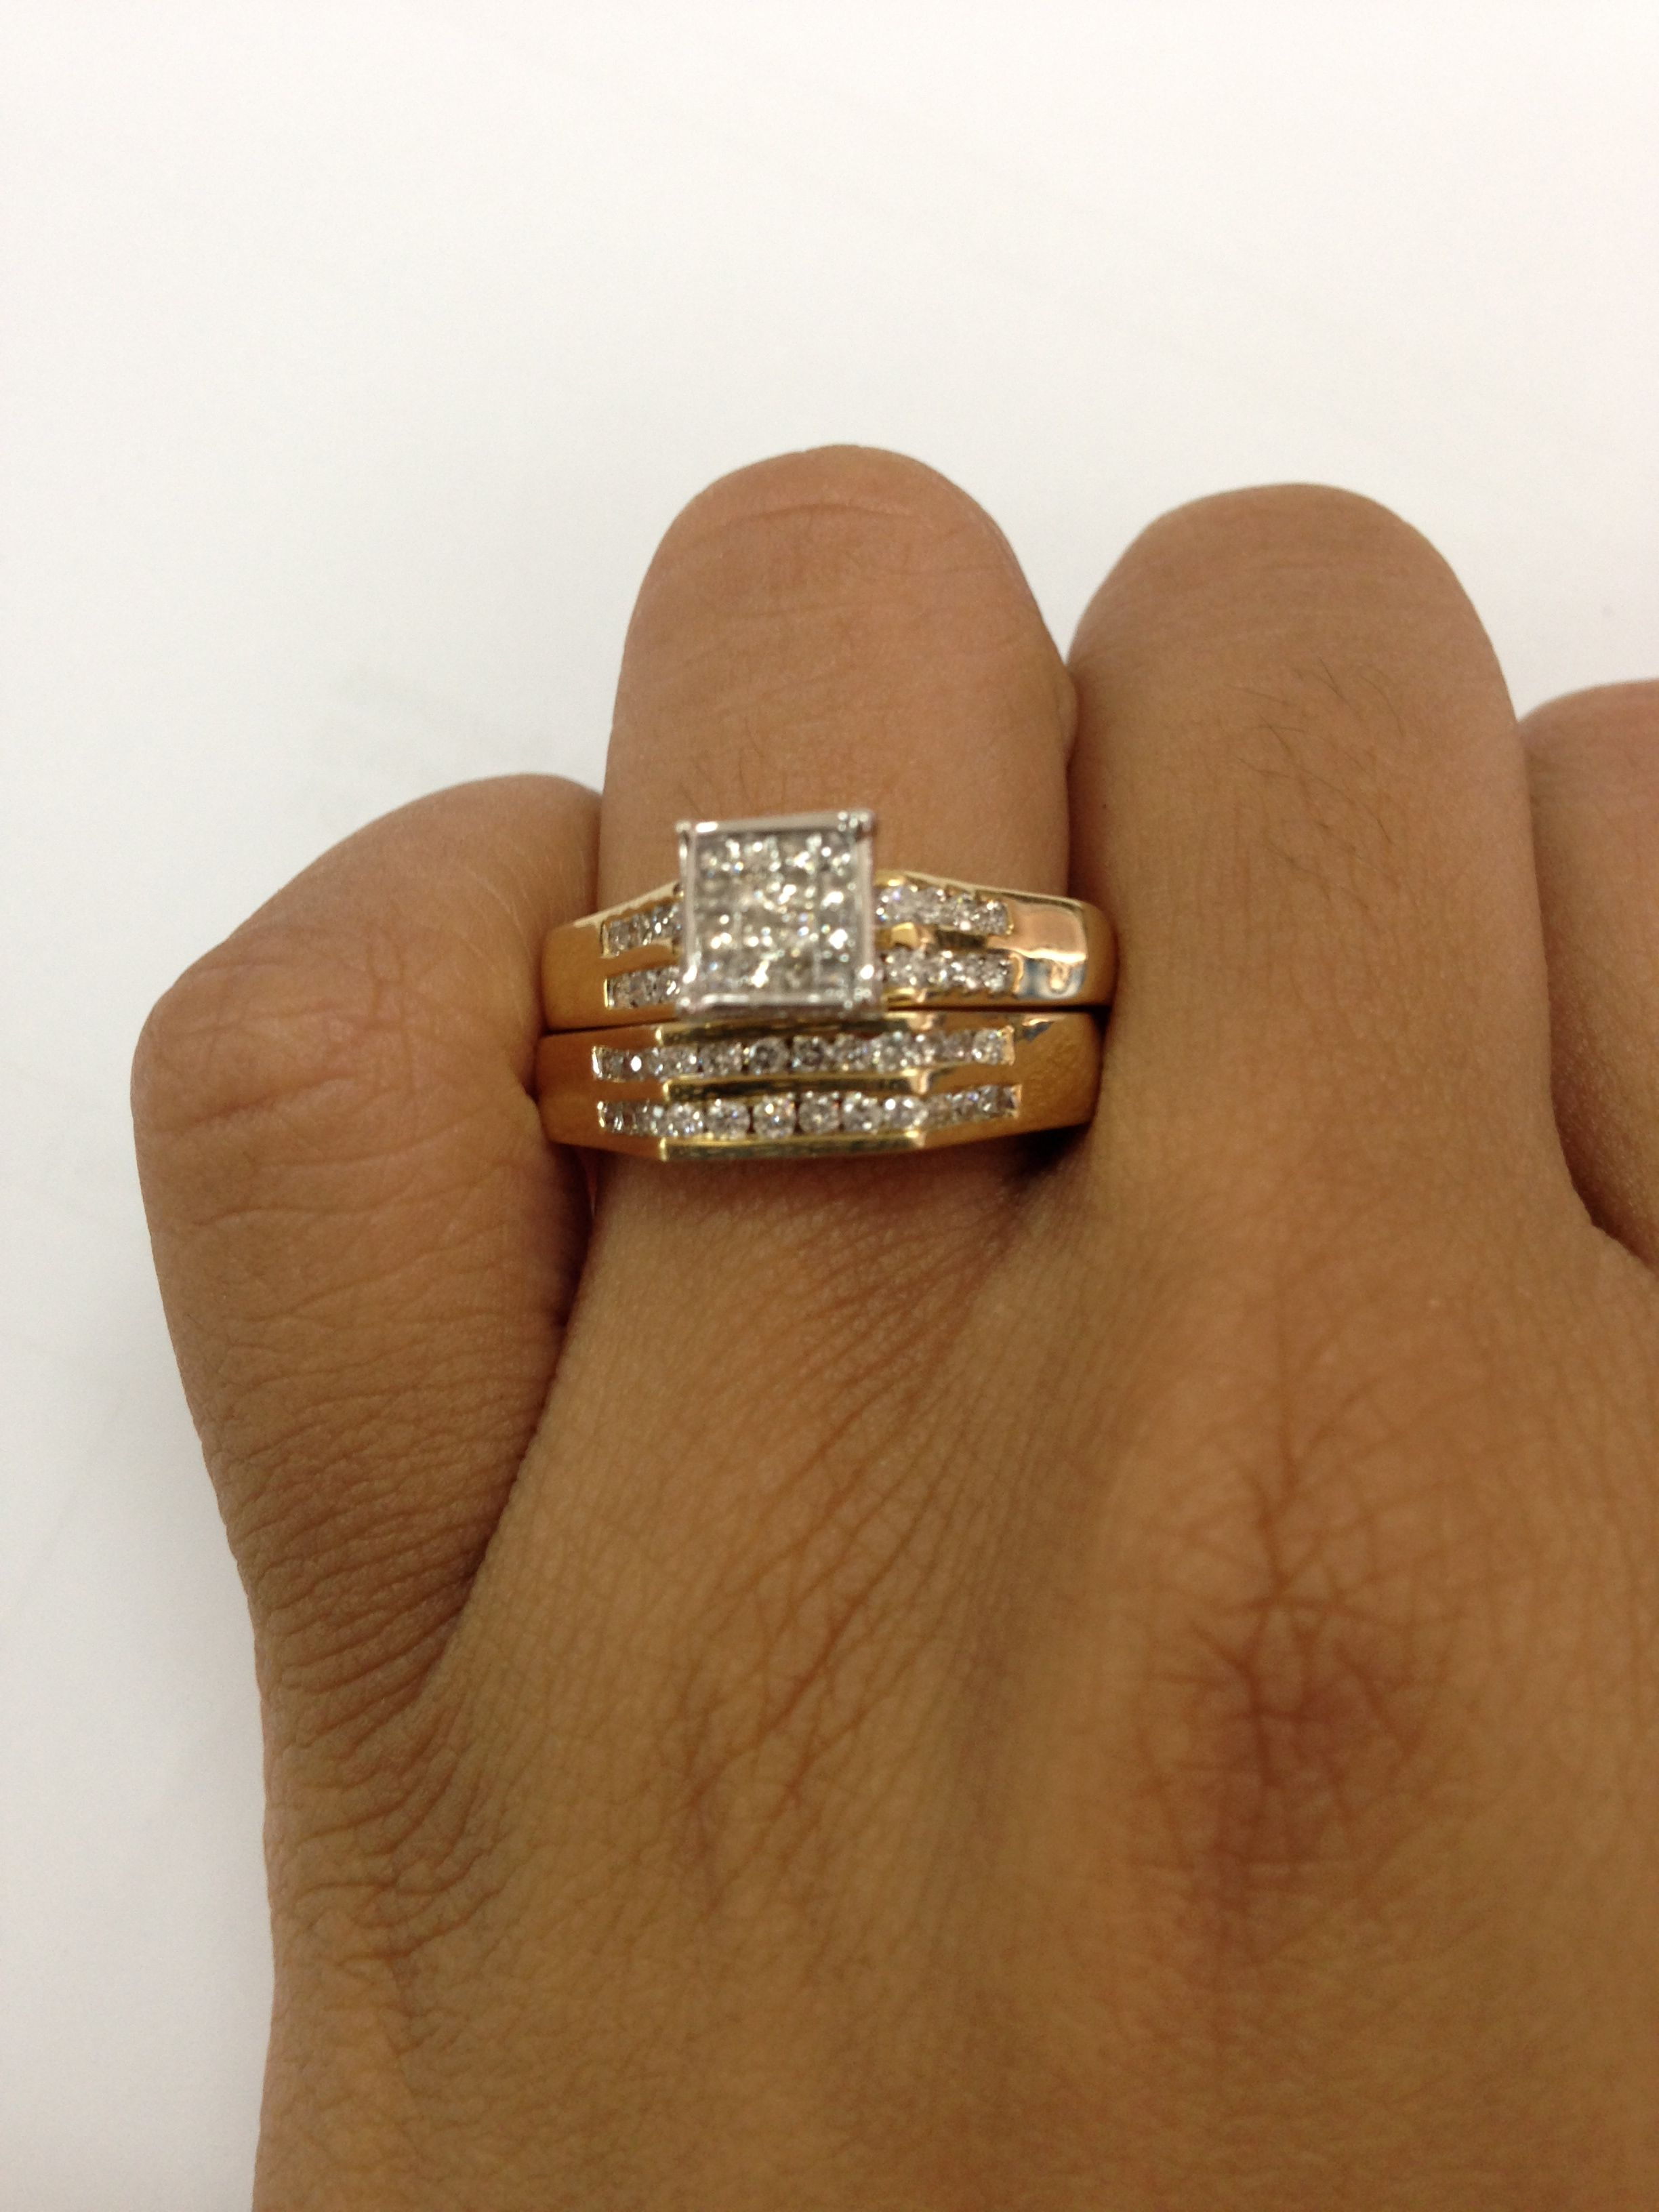 1 Carat Diamond Trio Wedding Ring Set 14k White Gold